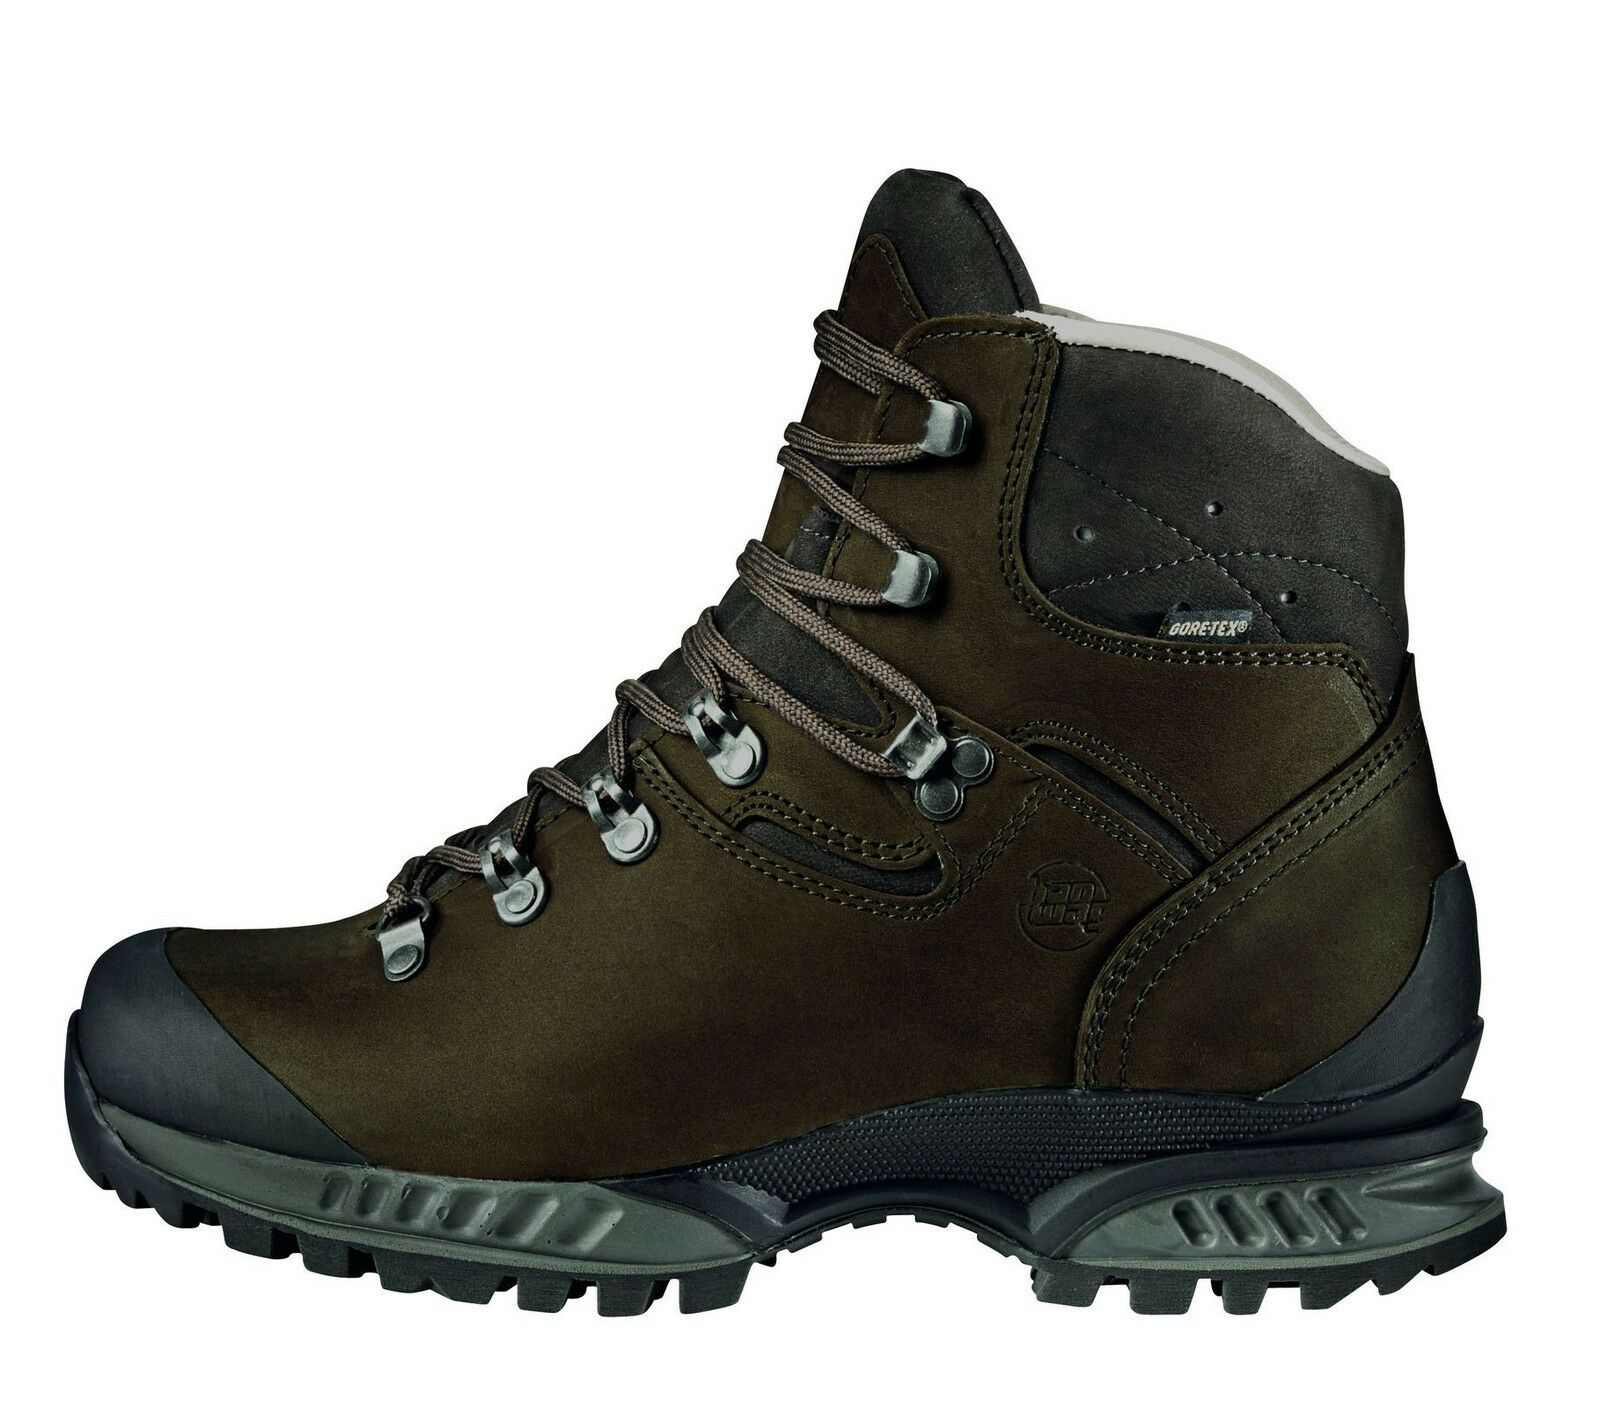 Hanwag Trekking shoes Tatra Narrow GTX Size 9 - 43,